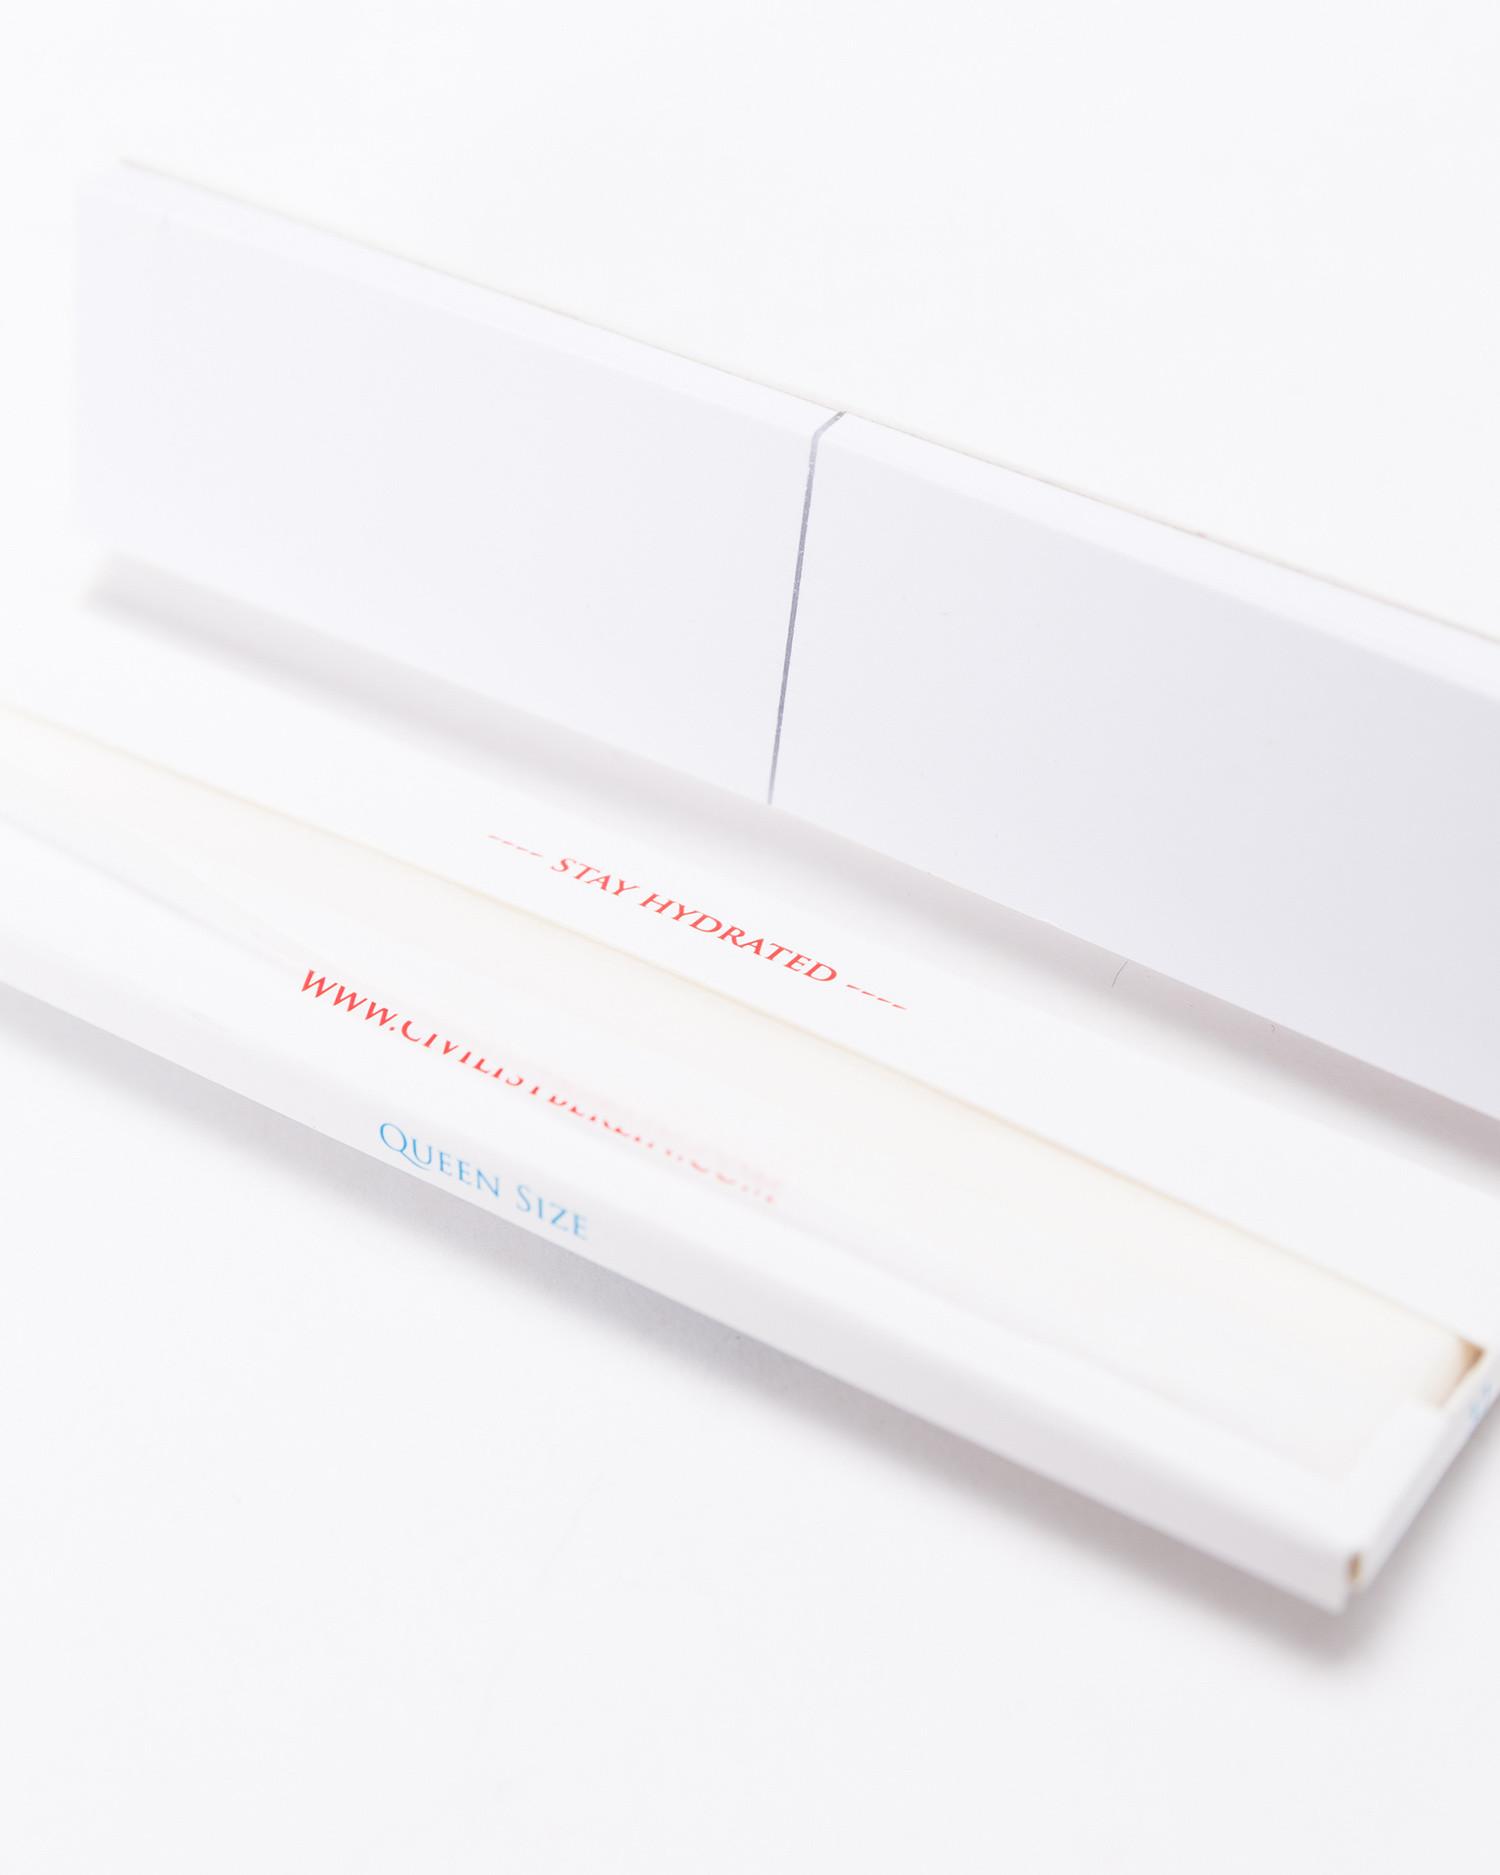 Civilist Zigarettenpapier White